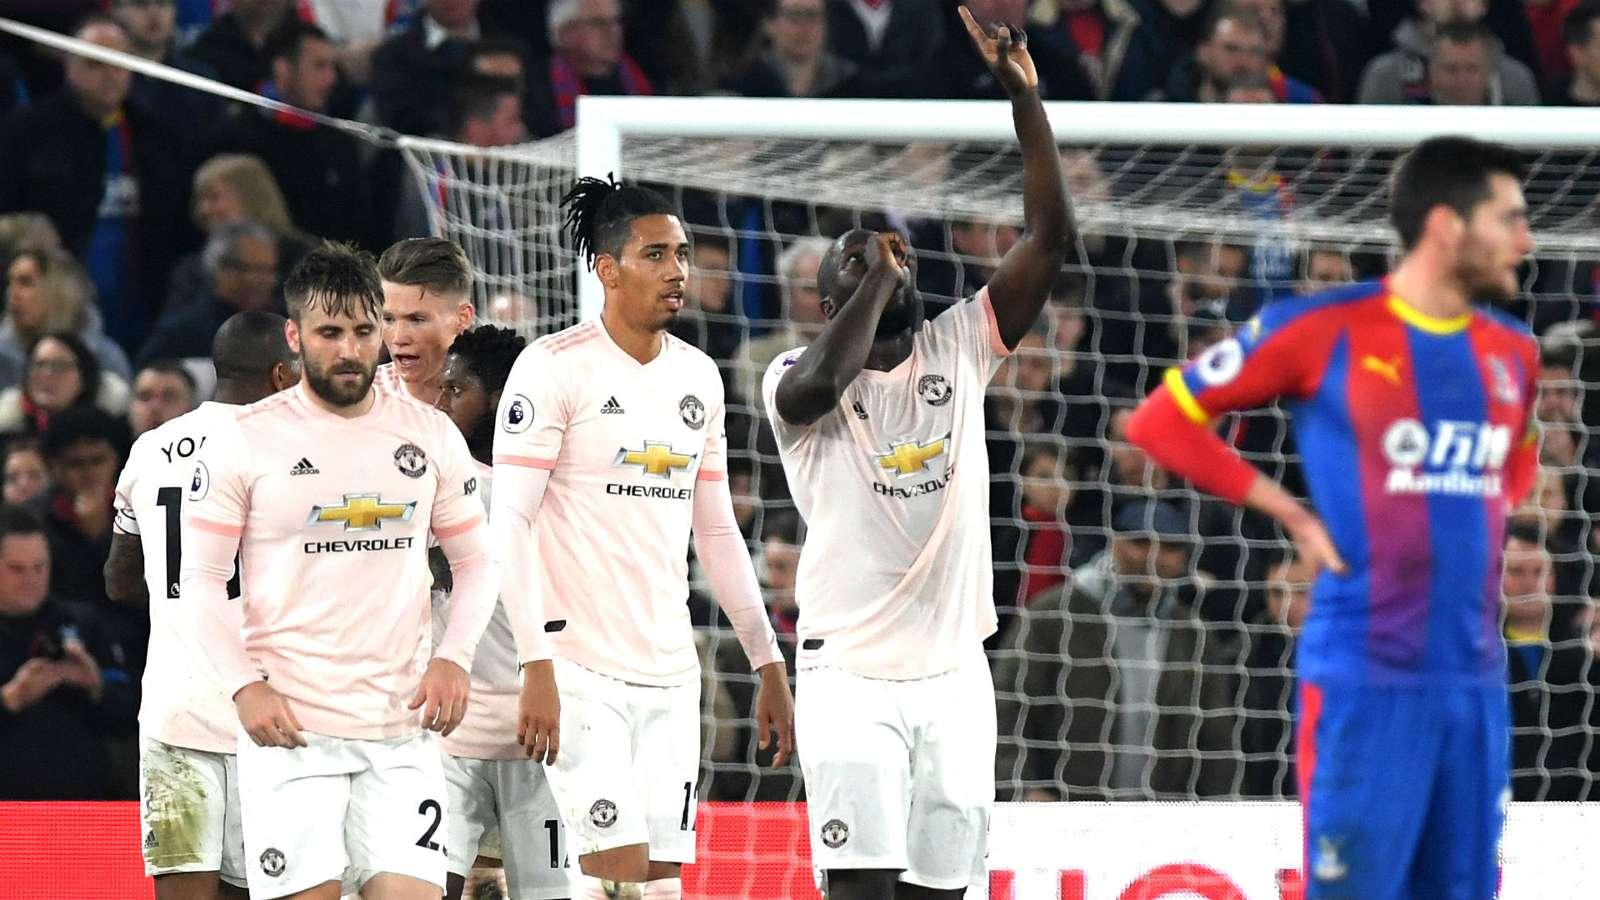 lukaku Okay NG - Crystal Palace vs Manchester United 1-3: Premier League Match Report & Highlights [Watch Video]